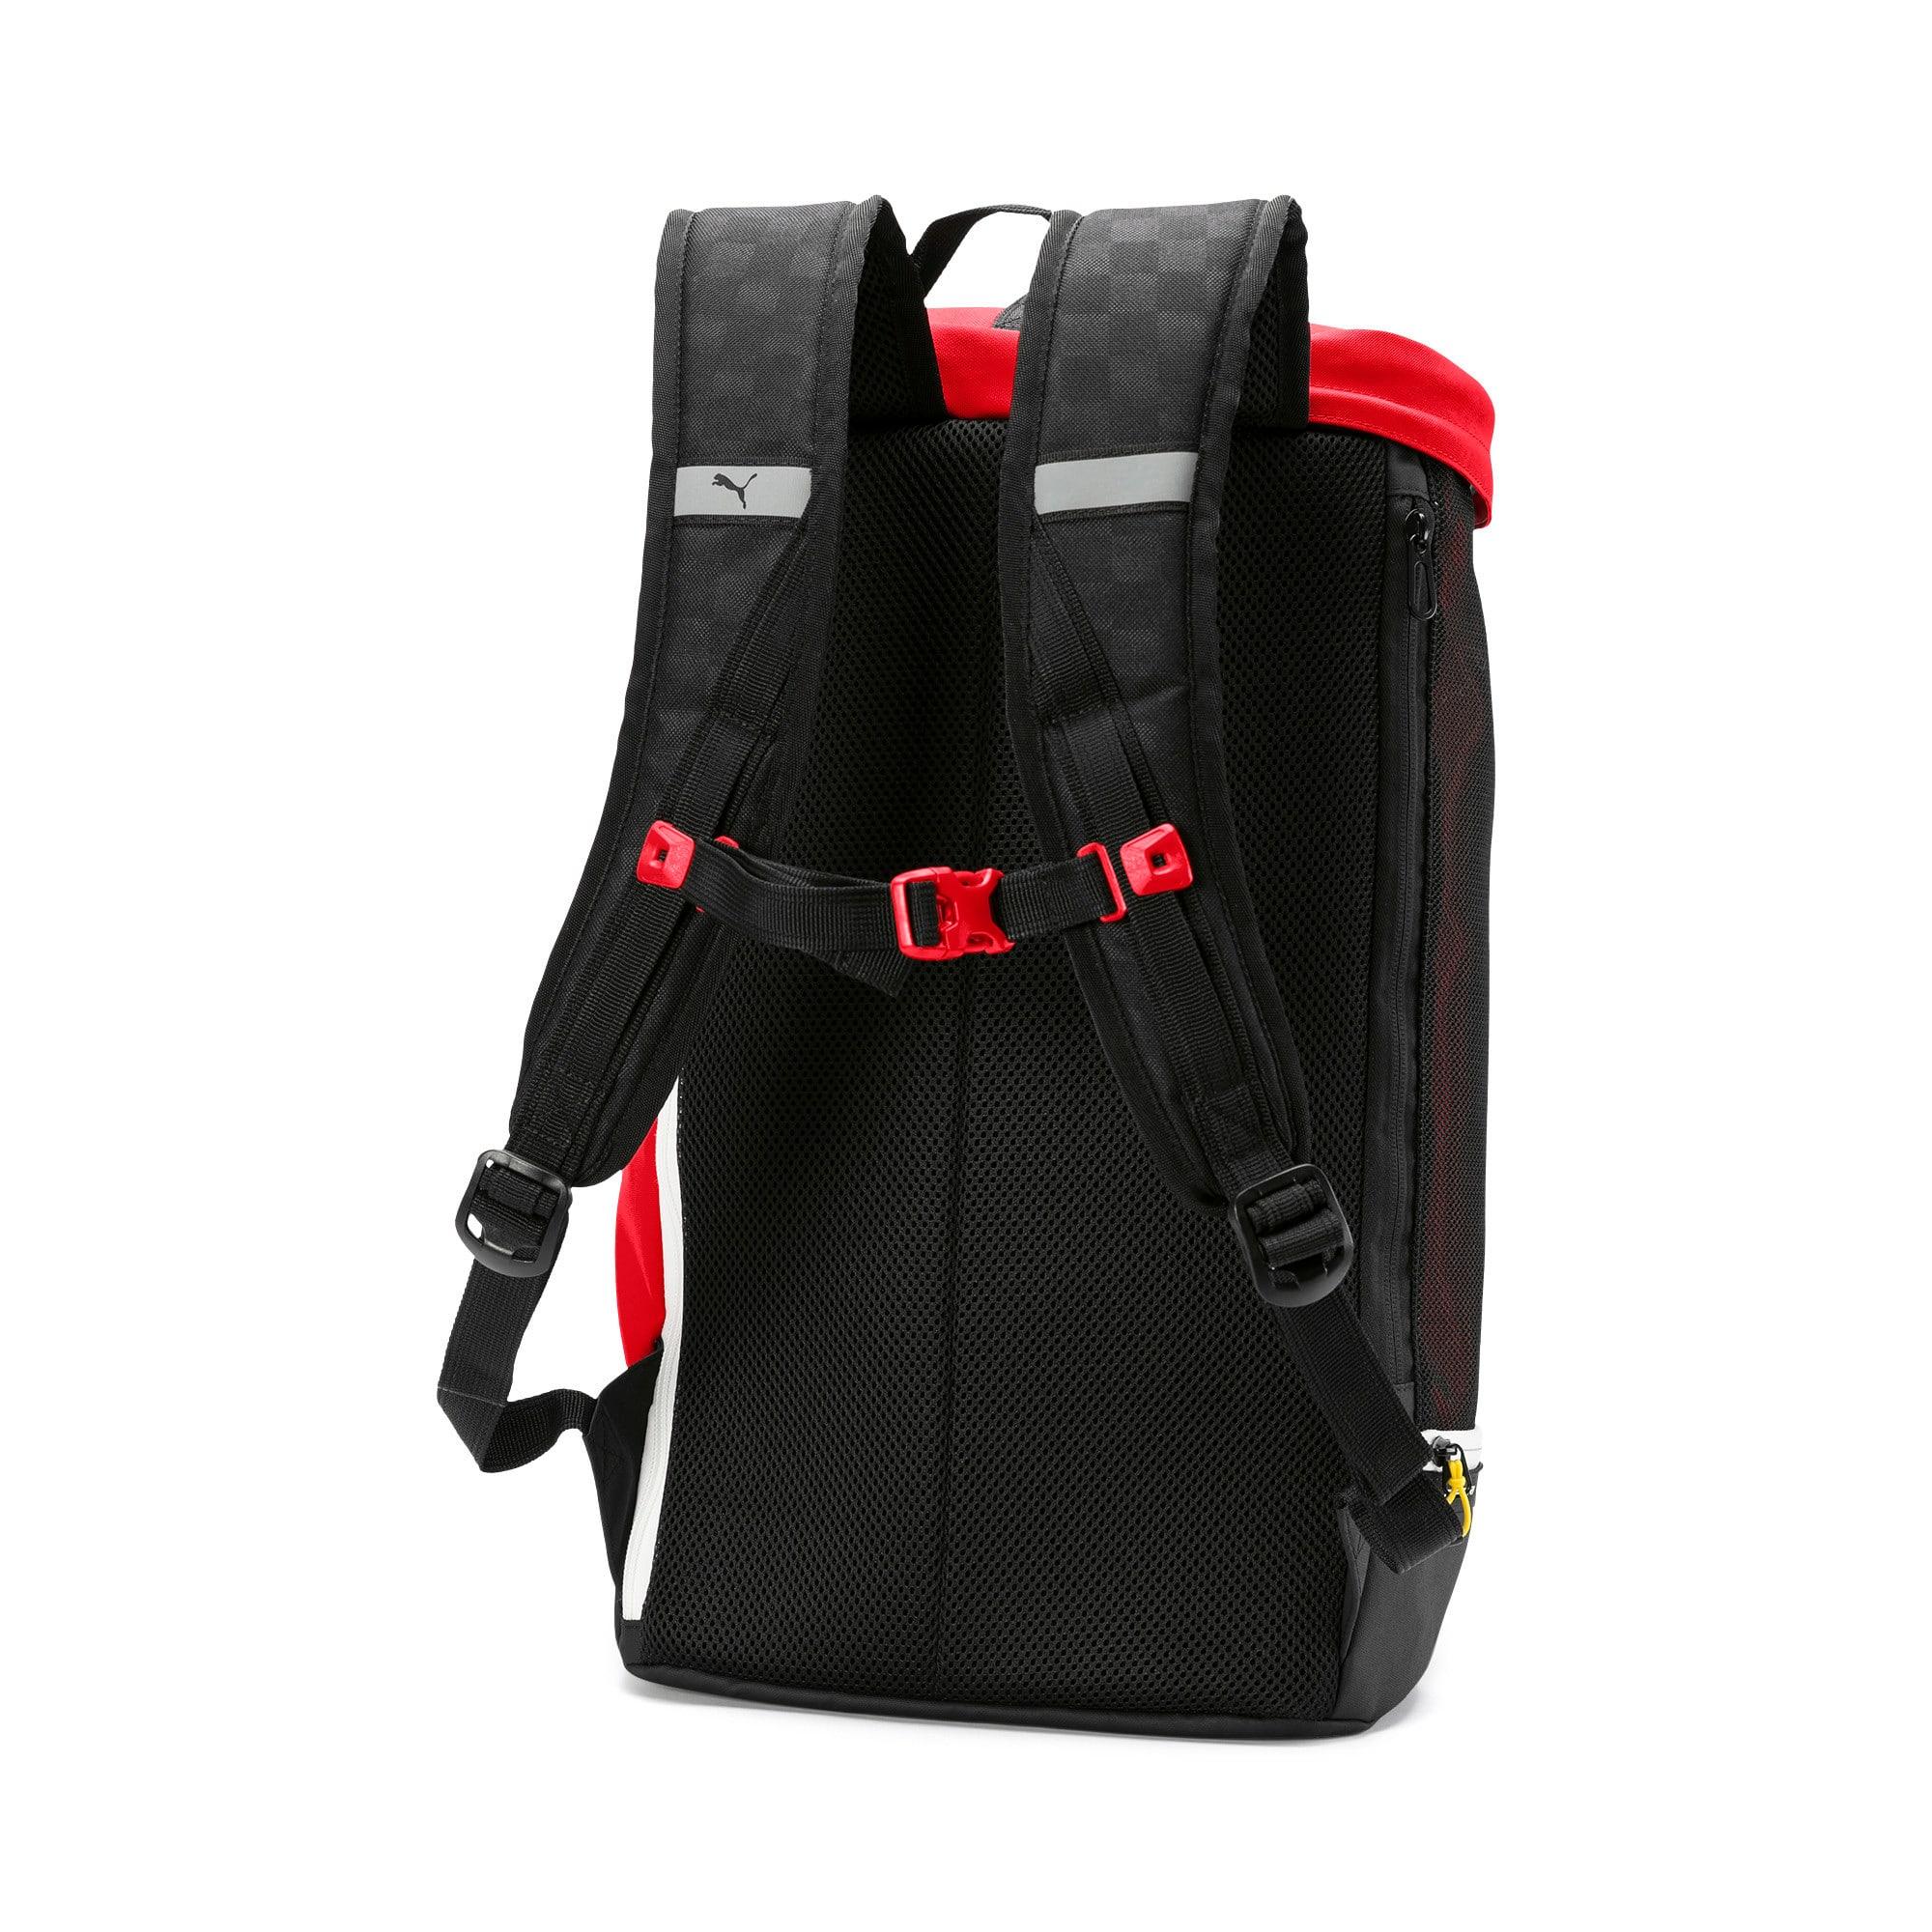 Thumbnail 2 of Ferrari Fanwear RCT Backpack, Rosso Corsa, medium-IND